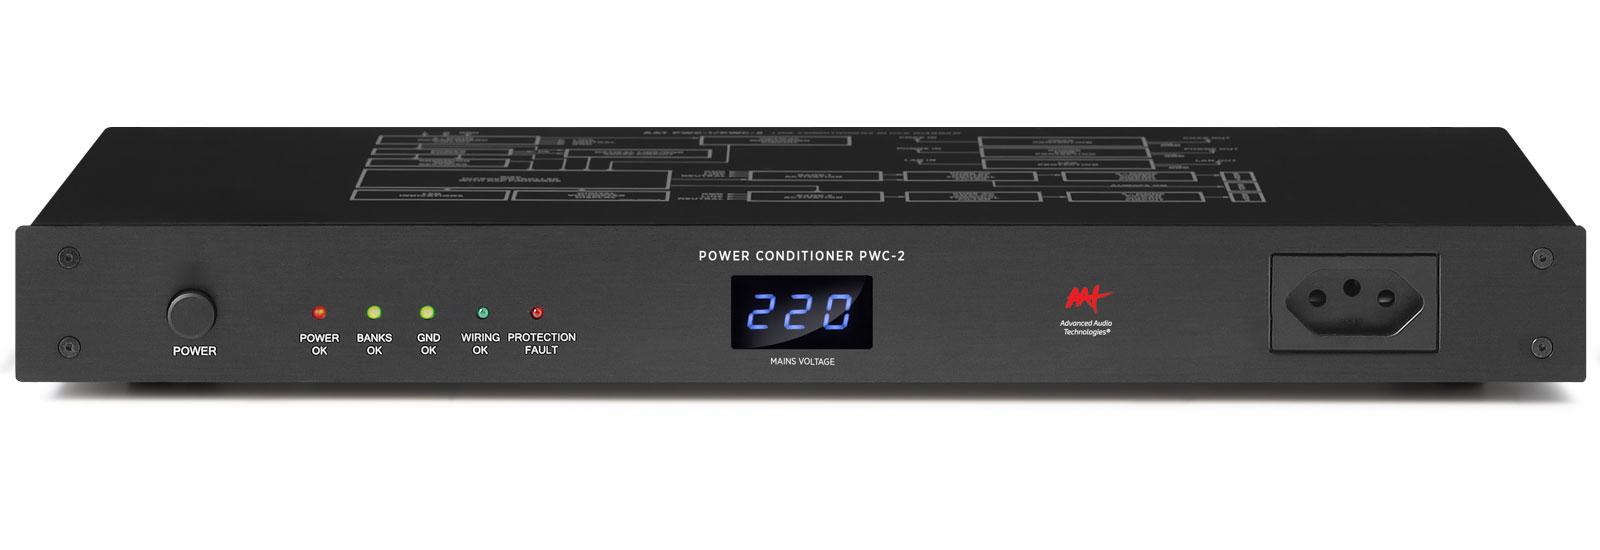 AAT PWC-2 - Condicionador de energia com DISPLAY microprocessado com 8 tomadas traseiras e 1 frontal.  - Audio Video & cia